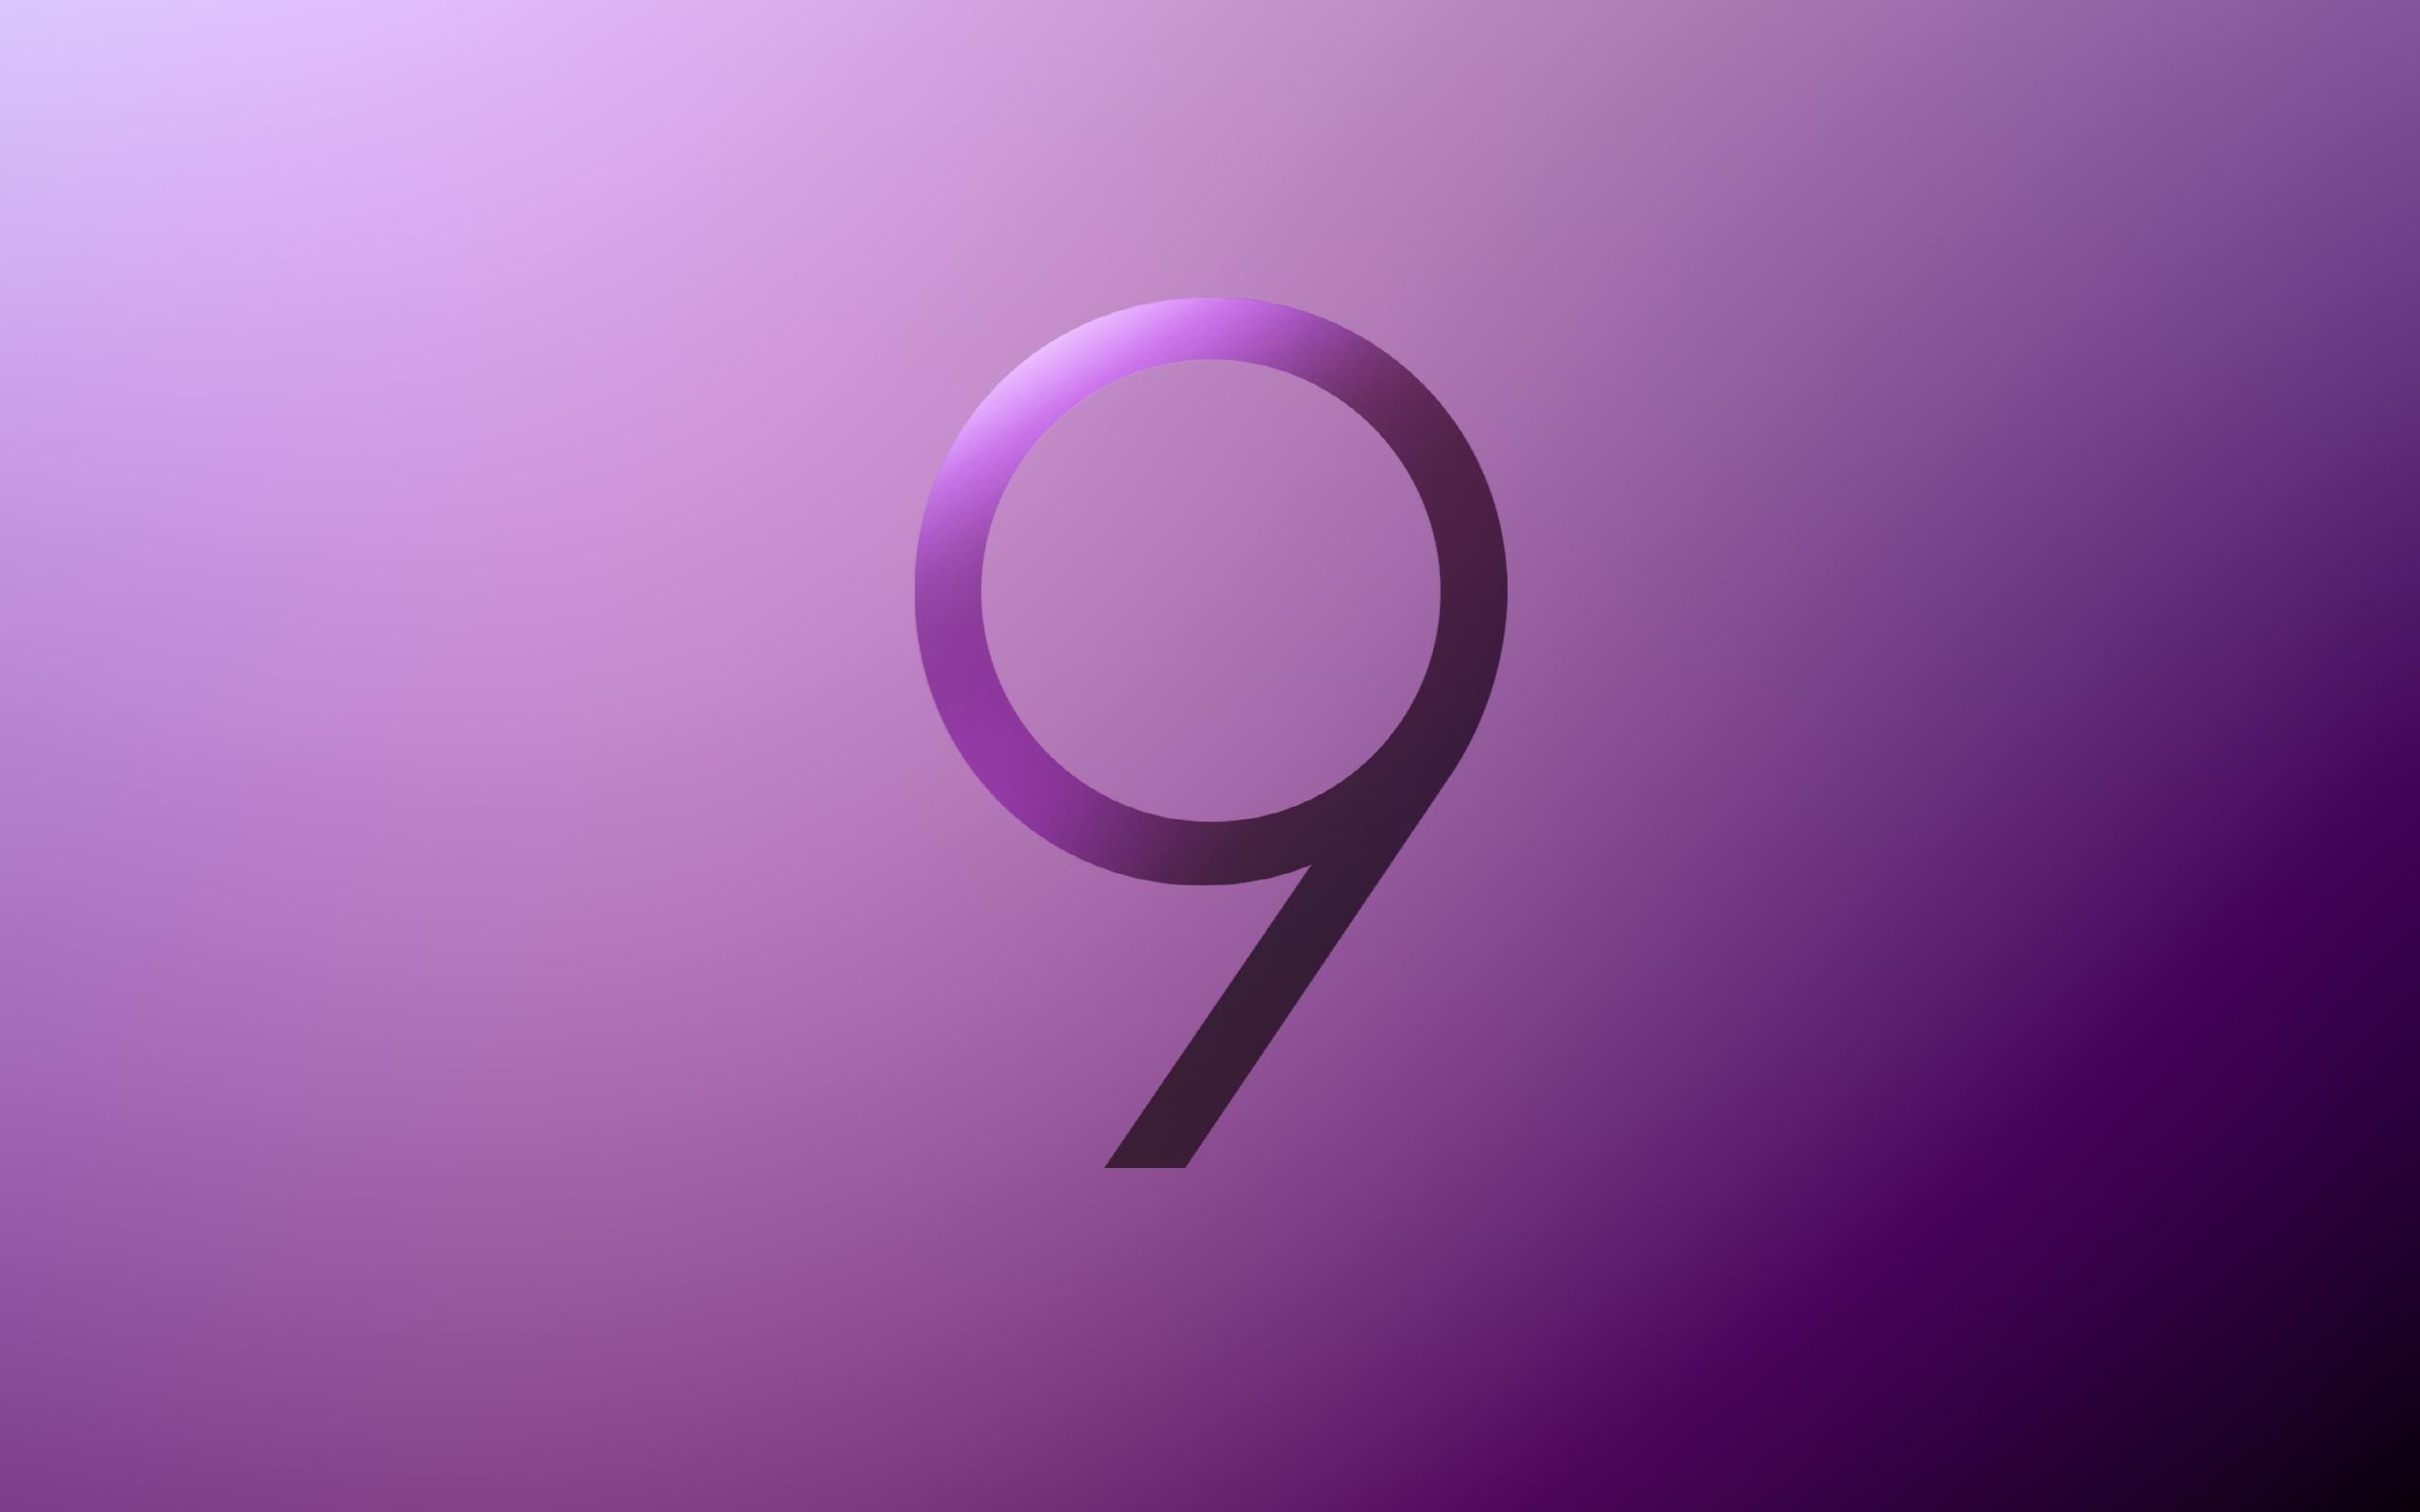 Samsung Galaxy S9 Stock Purple Wallpaper Download High Resolution 4k Wallpaper